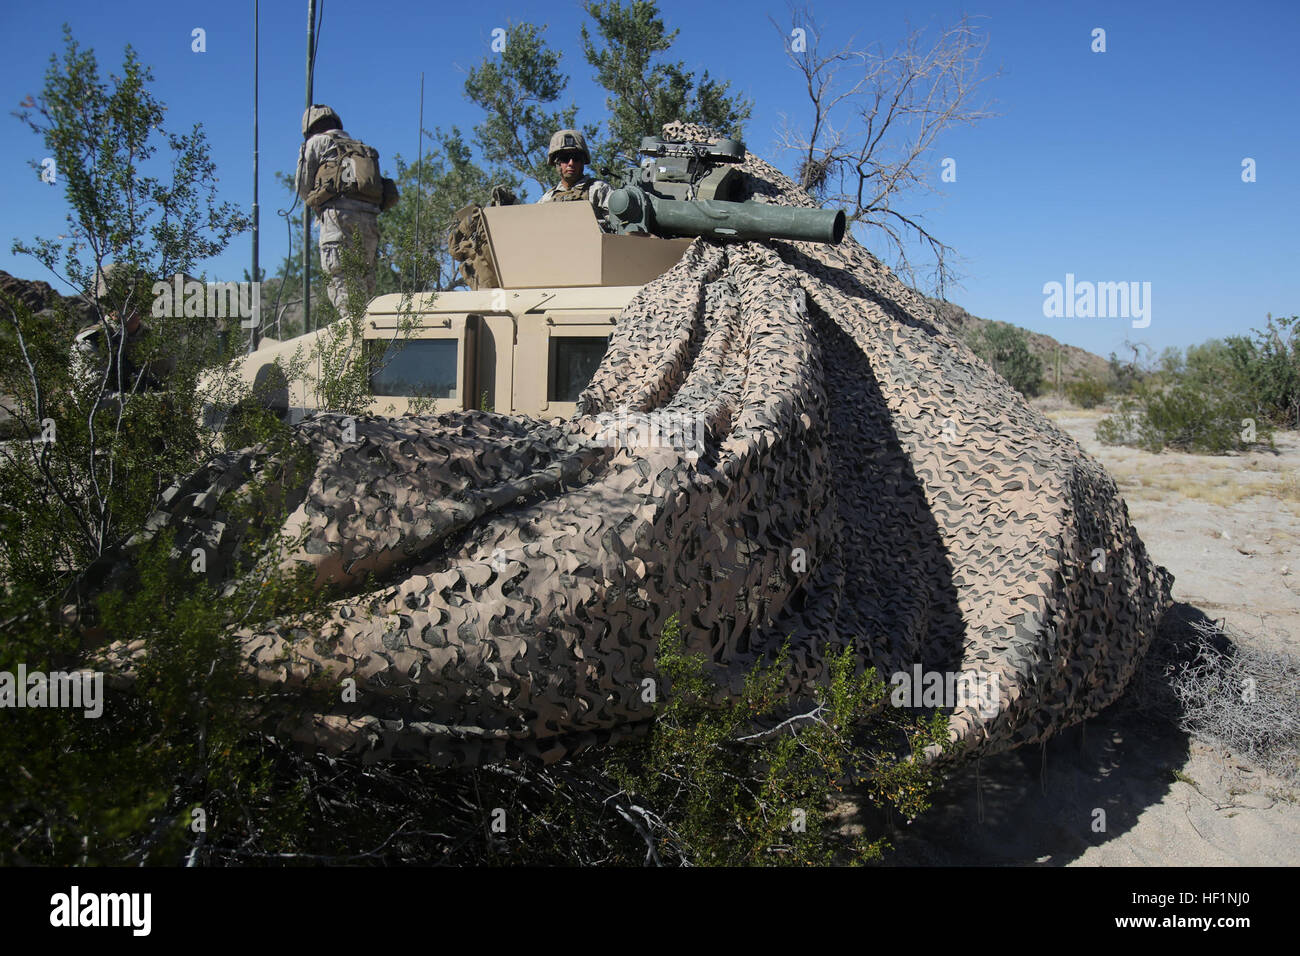 MARINE CORPS AIR STATION YUMA, Ariz. – Lance Cpl. John Hollis, machine gunner, Combined Anti-Armor Team 2, 1st Battalion, - Stock Image